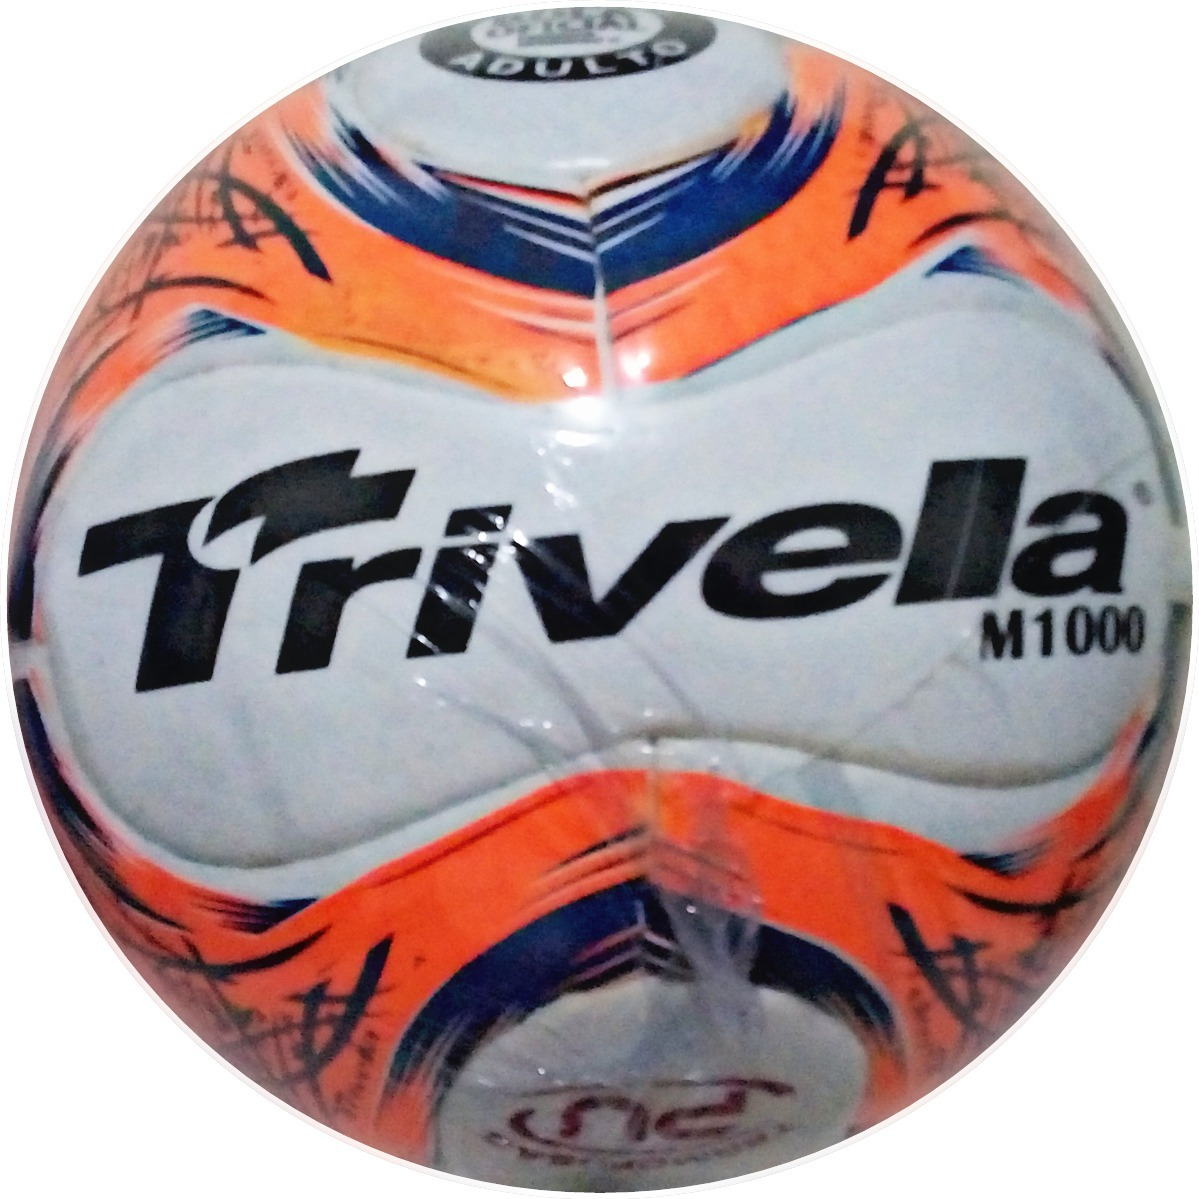 b2d3cbee00 kit 3 bolas futsal futebol trivella original - brasil gold. Carregando zoom.